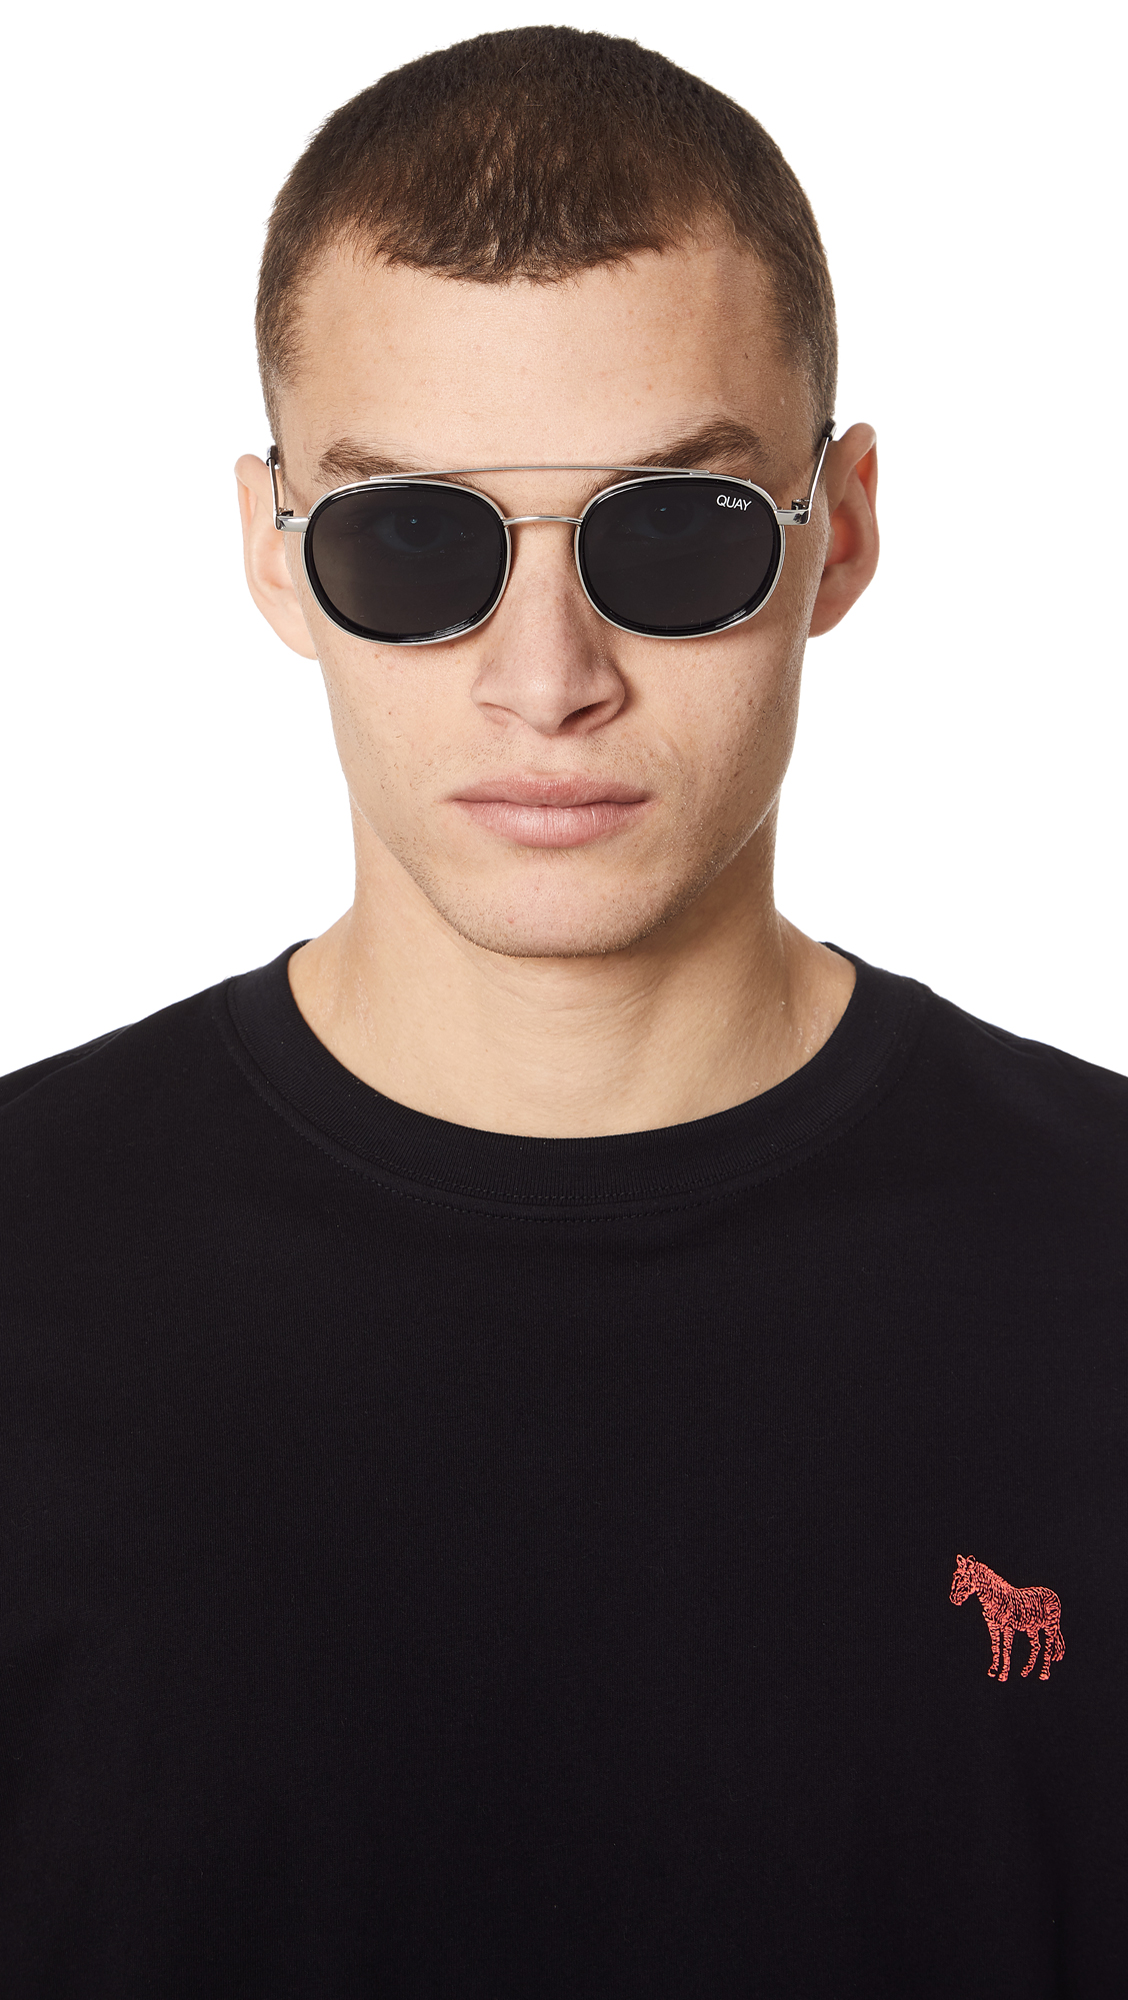 410b42e077 Quay Got It Covered Sunglasses